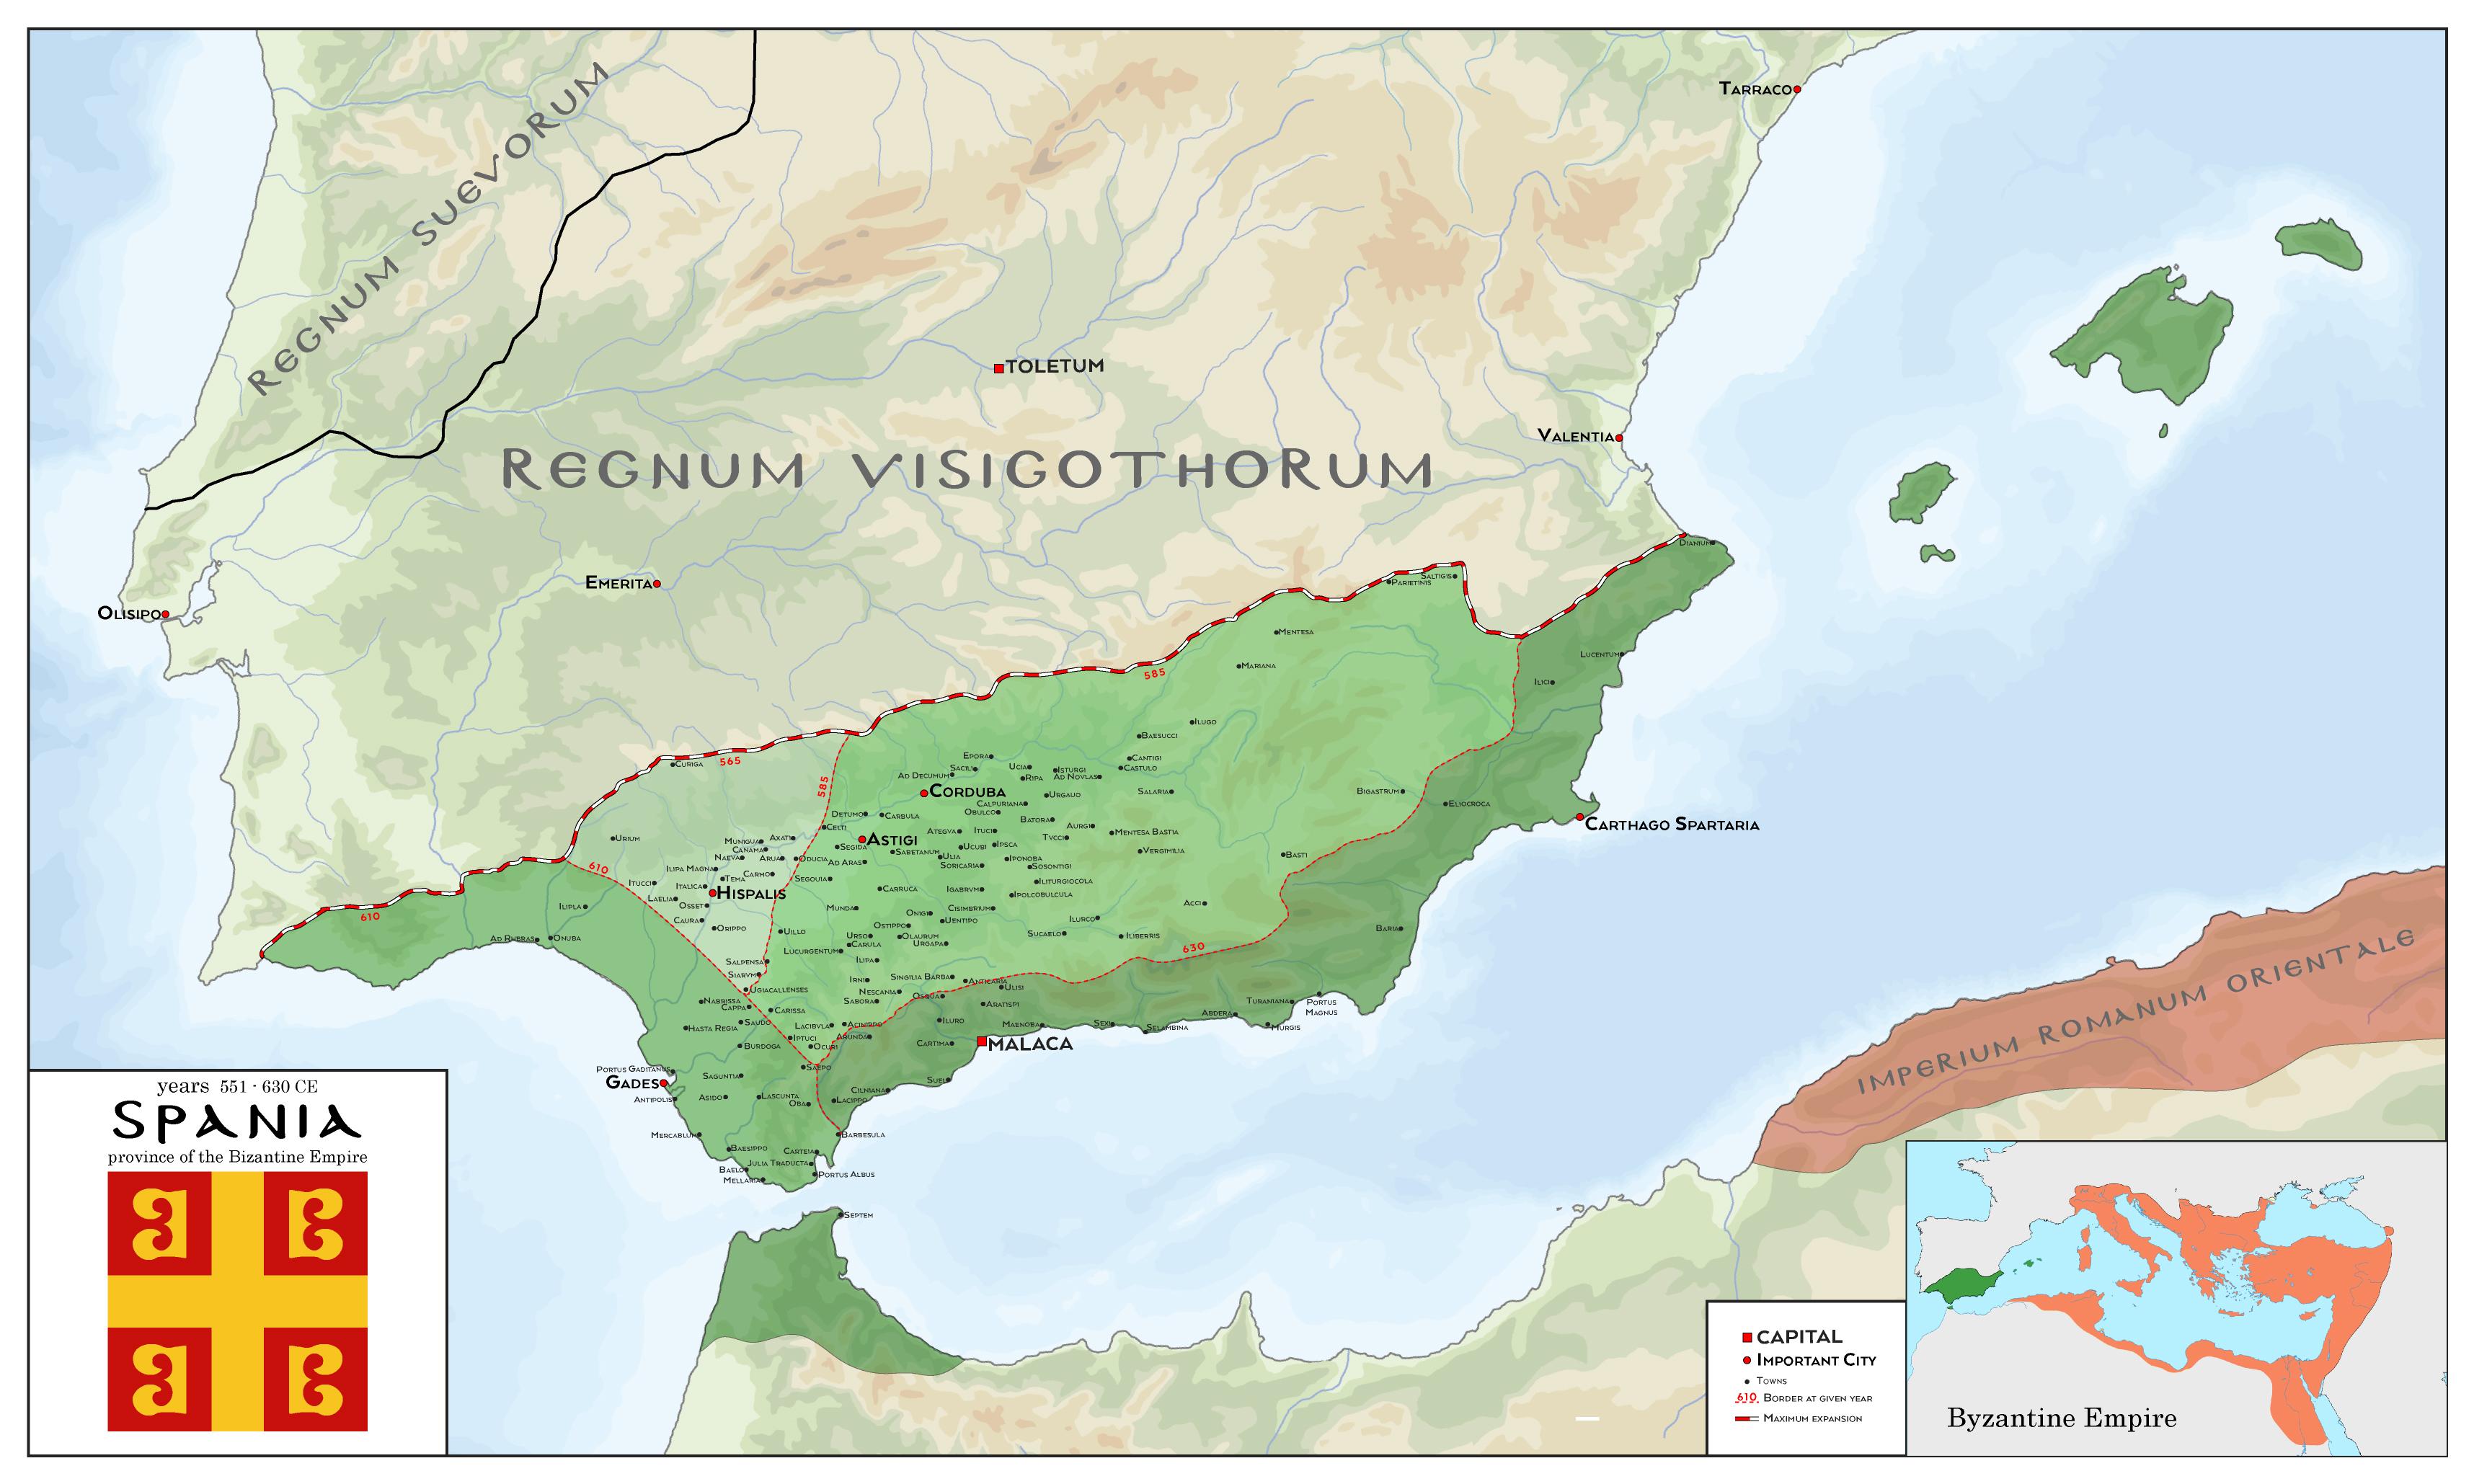 Spania - Bizantine Empire Province 551 - 630 CE by SalesWorlds